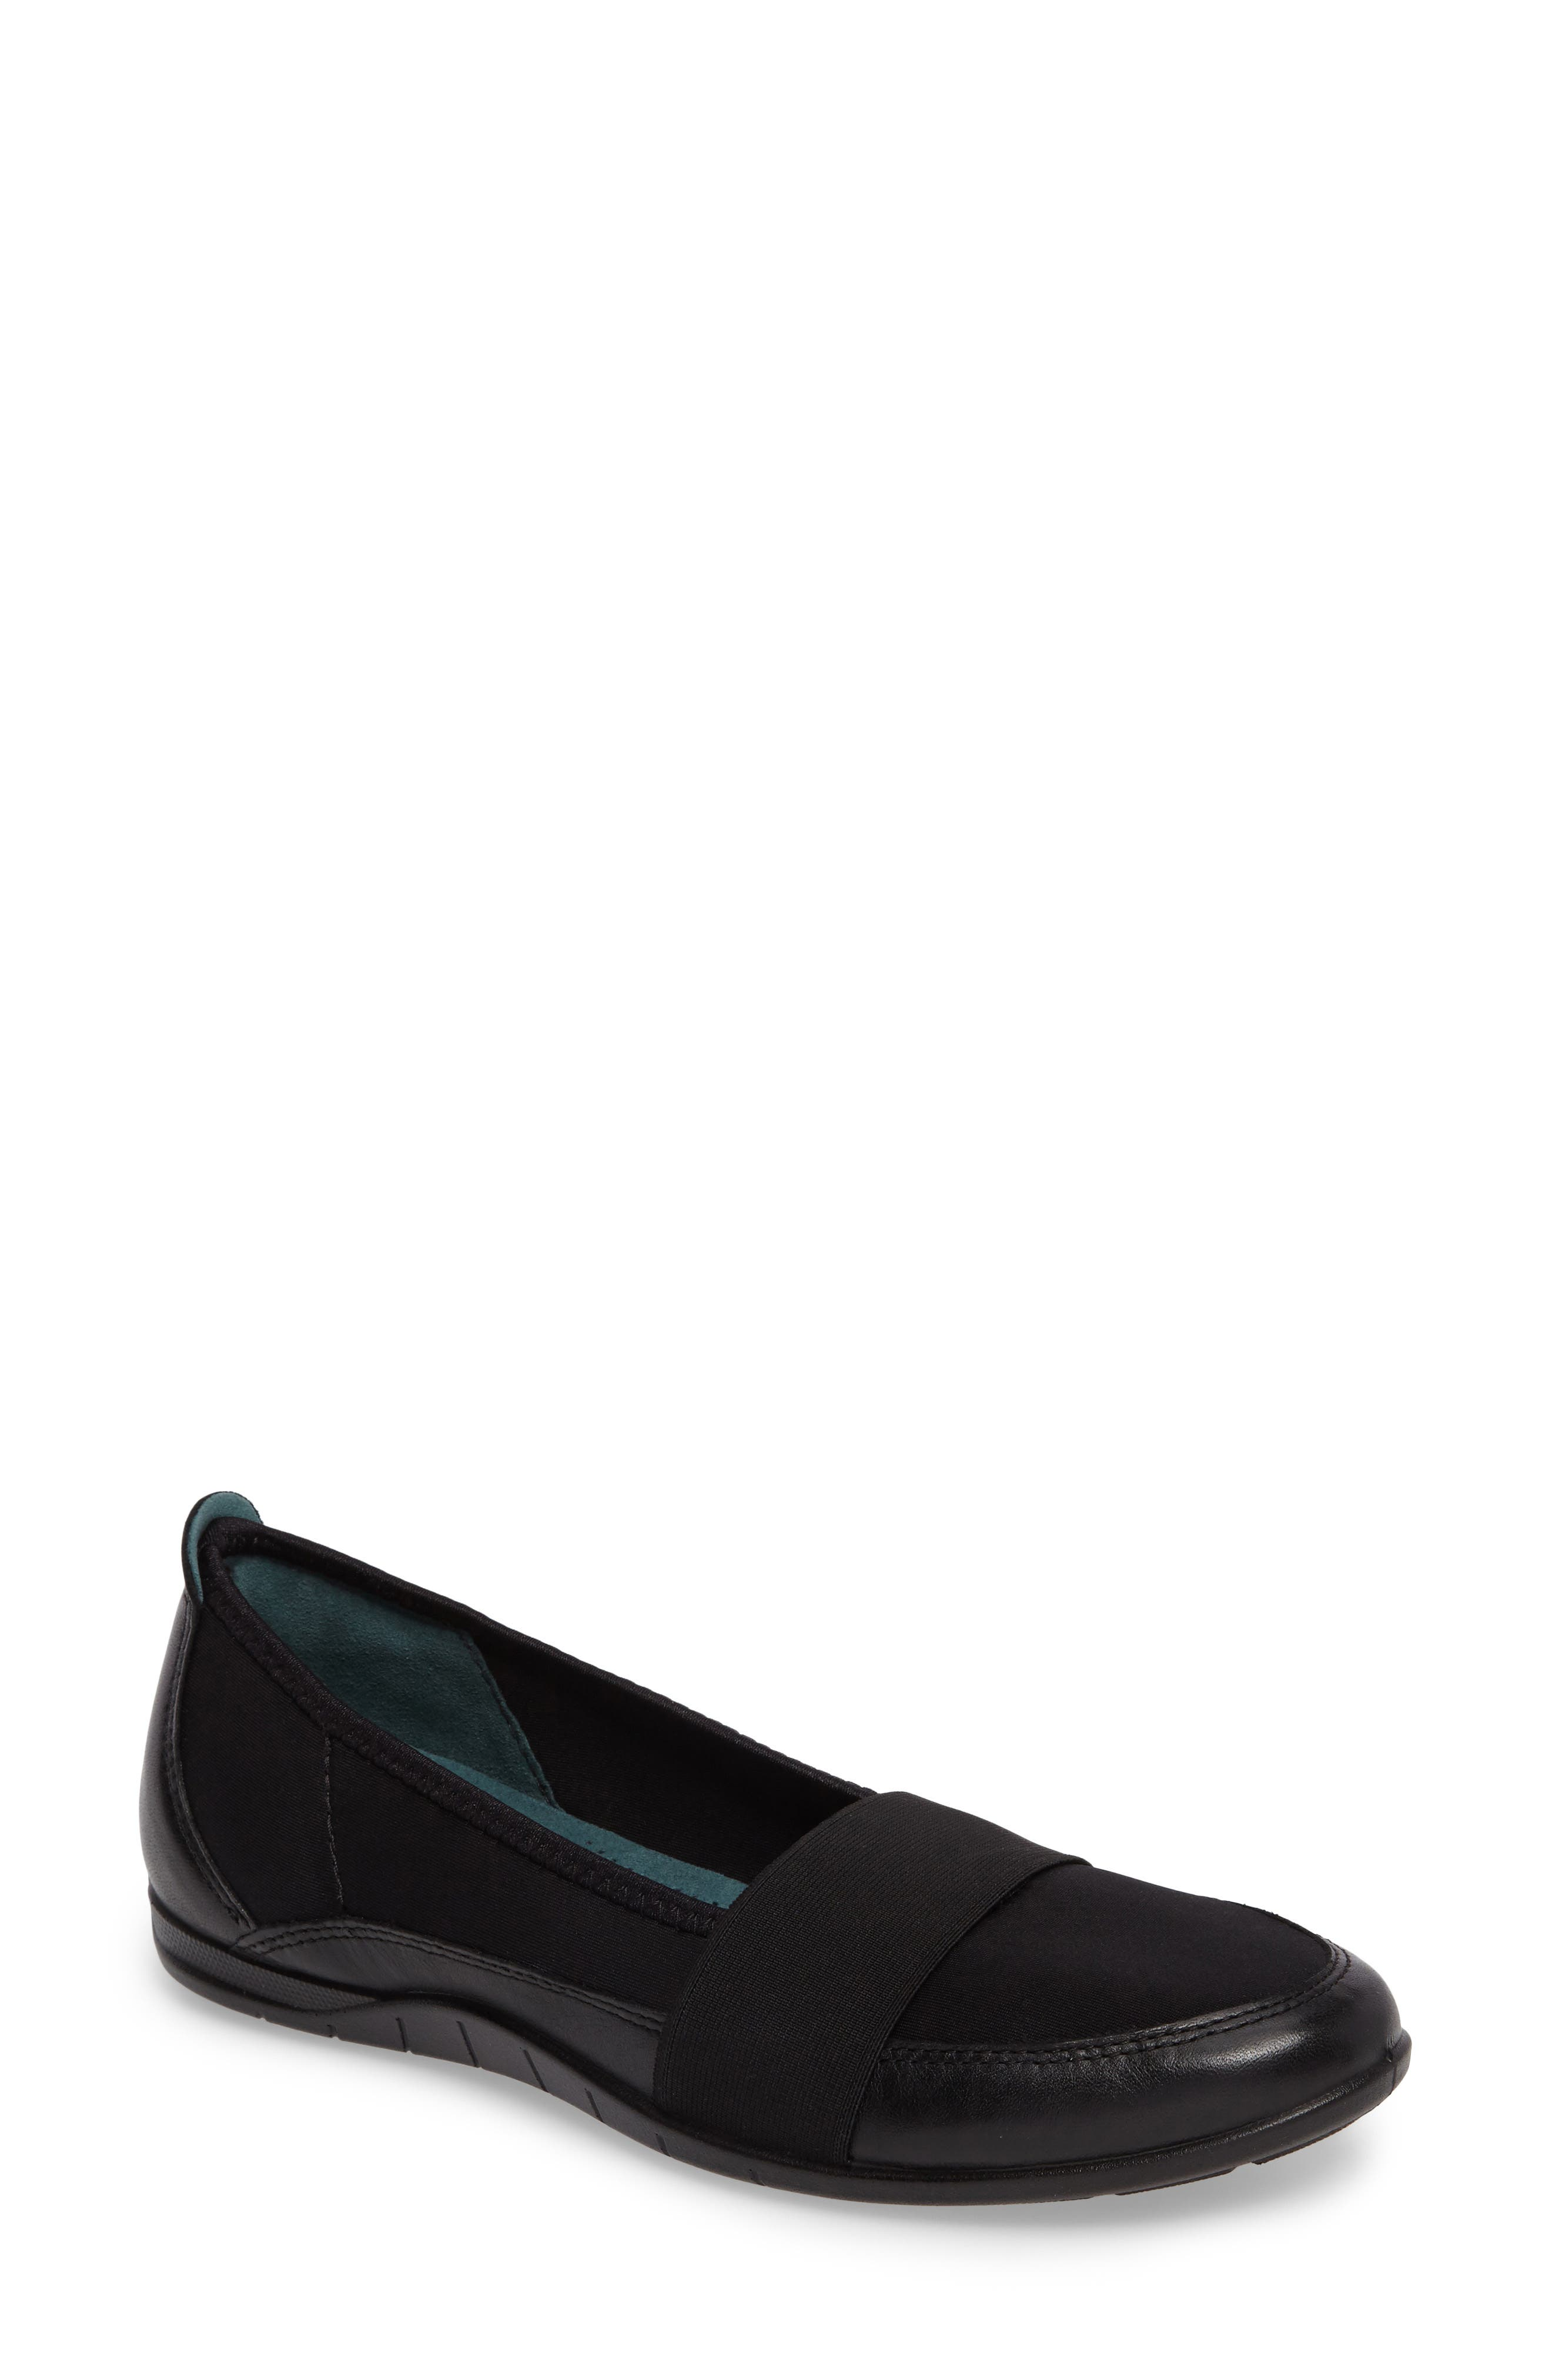 'Bluma' Slip-On Sneaker,                         Main,                         color, Black Leather